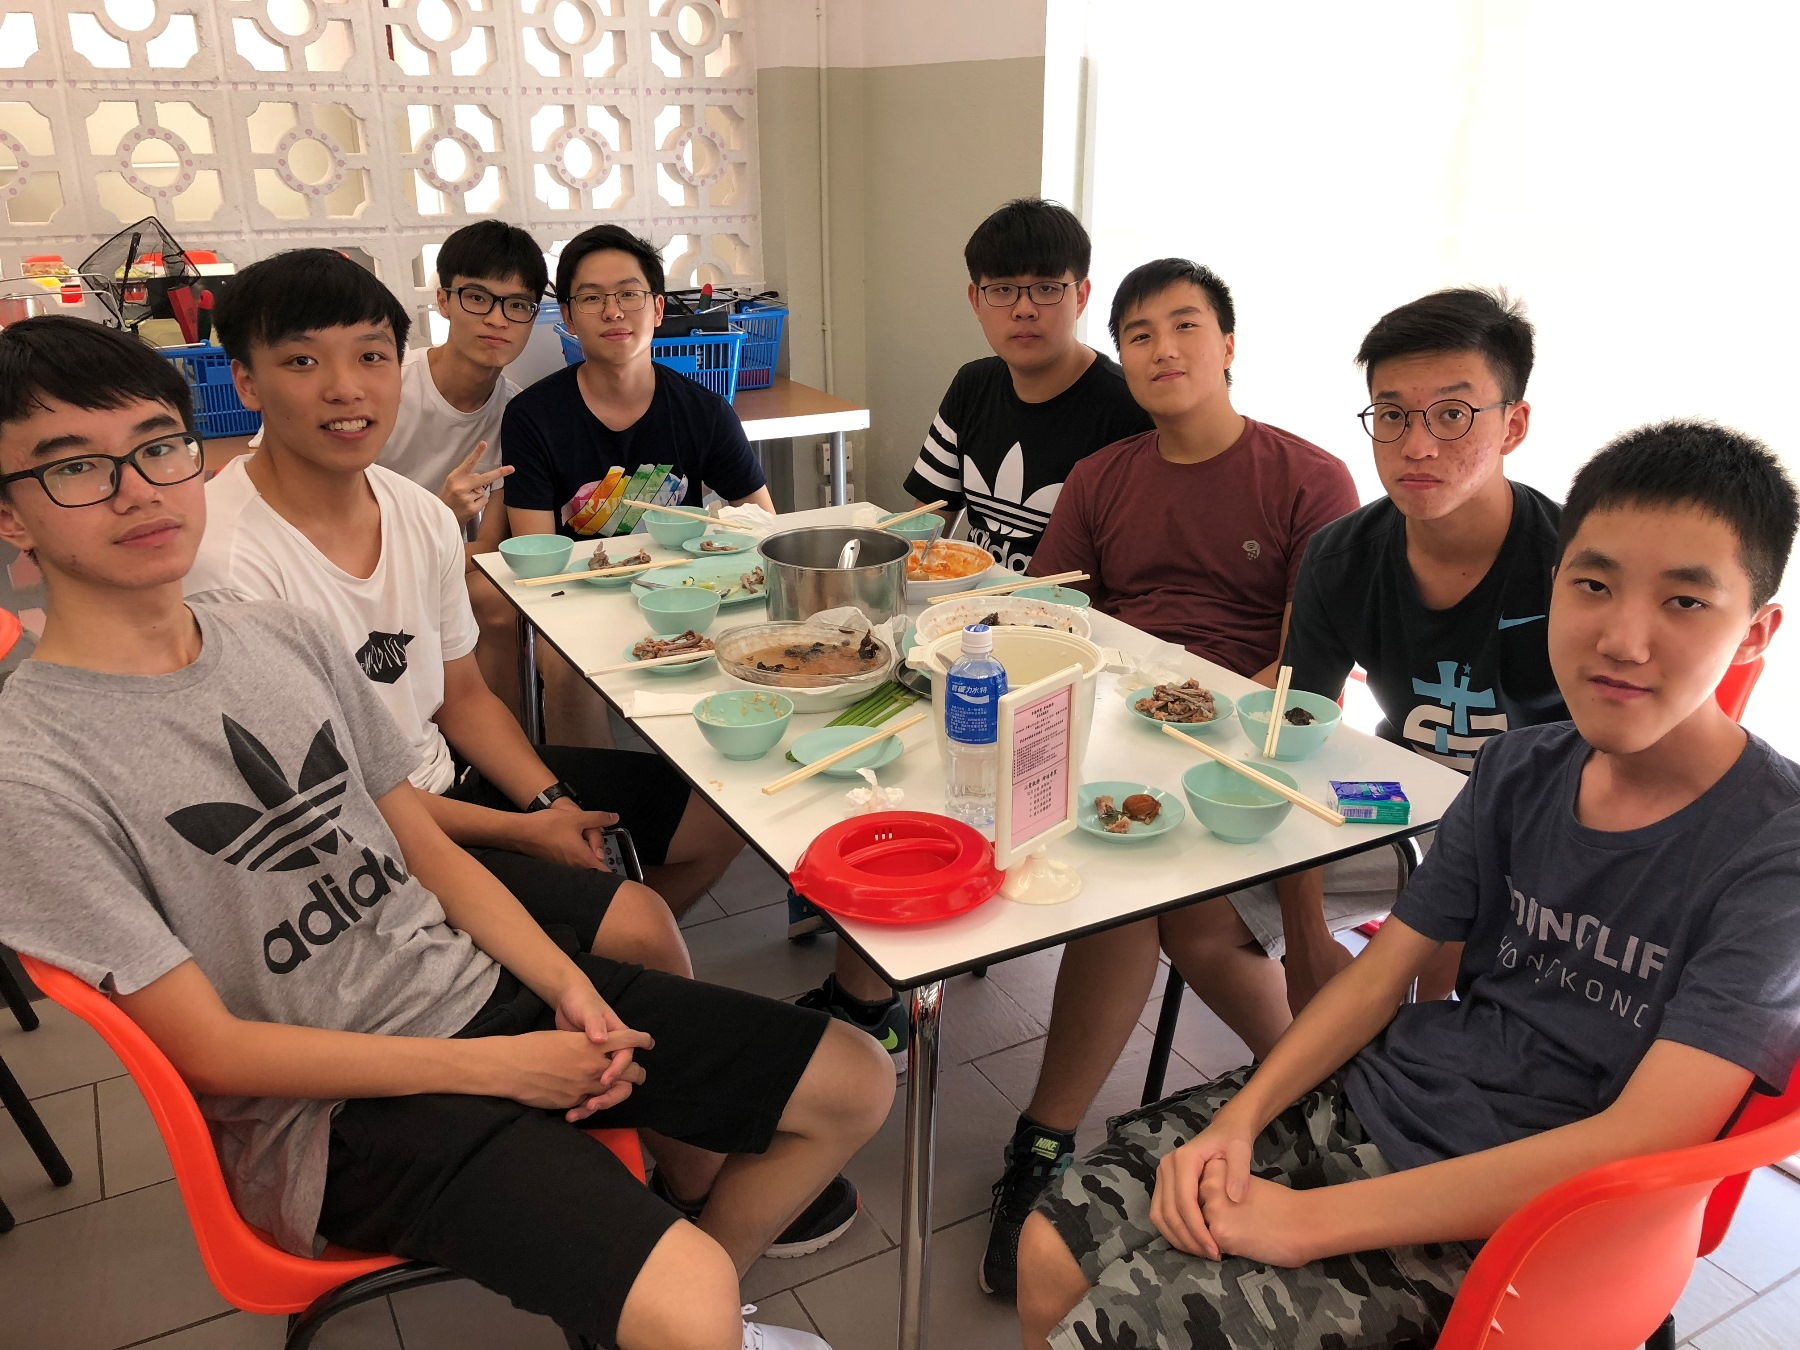 http://www.npc.edu.hk/sites/default/files/4_1119.jpg